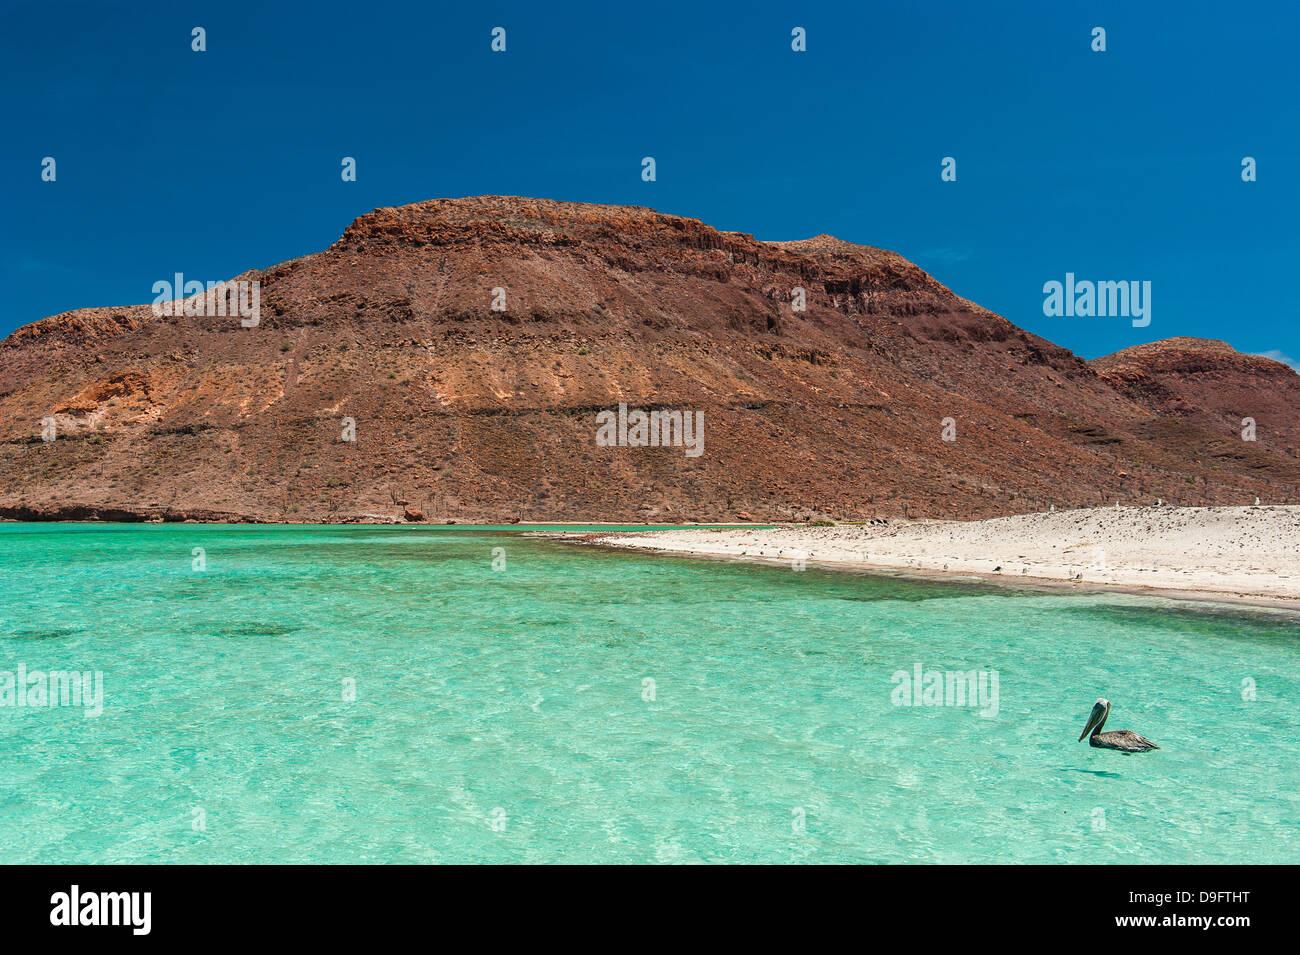 Pelícanos en las aguas turquesas en Isla Espiritu Santo, Baja California, México Imagen De Stock